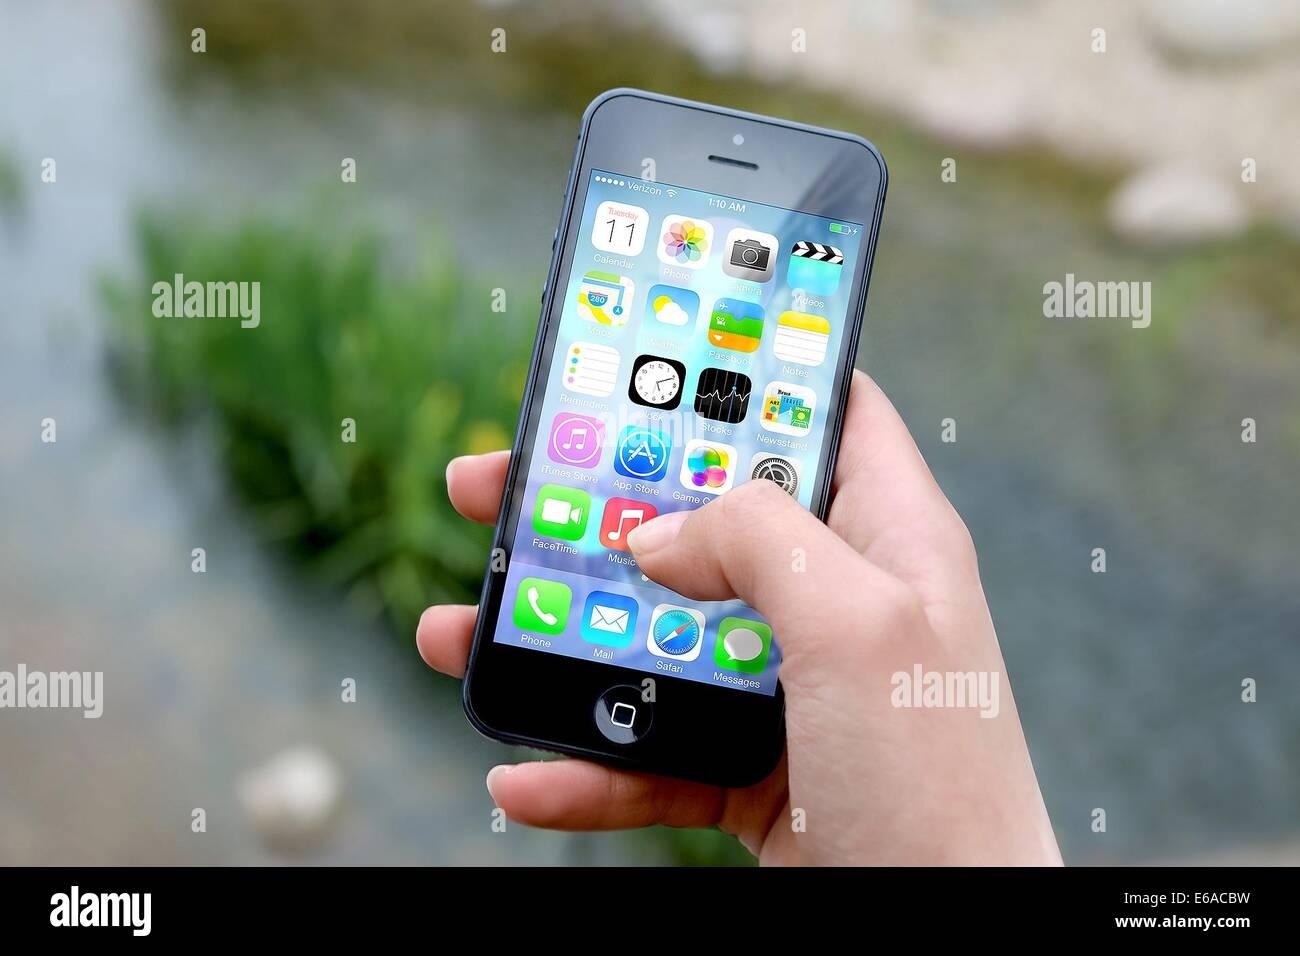 Iphone apps smartphone téléphone mobile apple inc Photo Stock